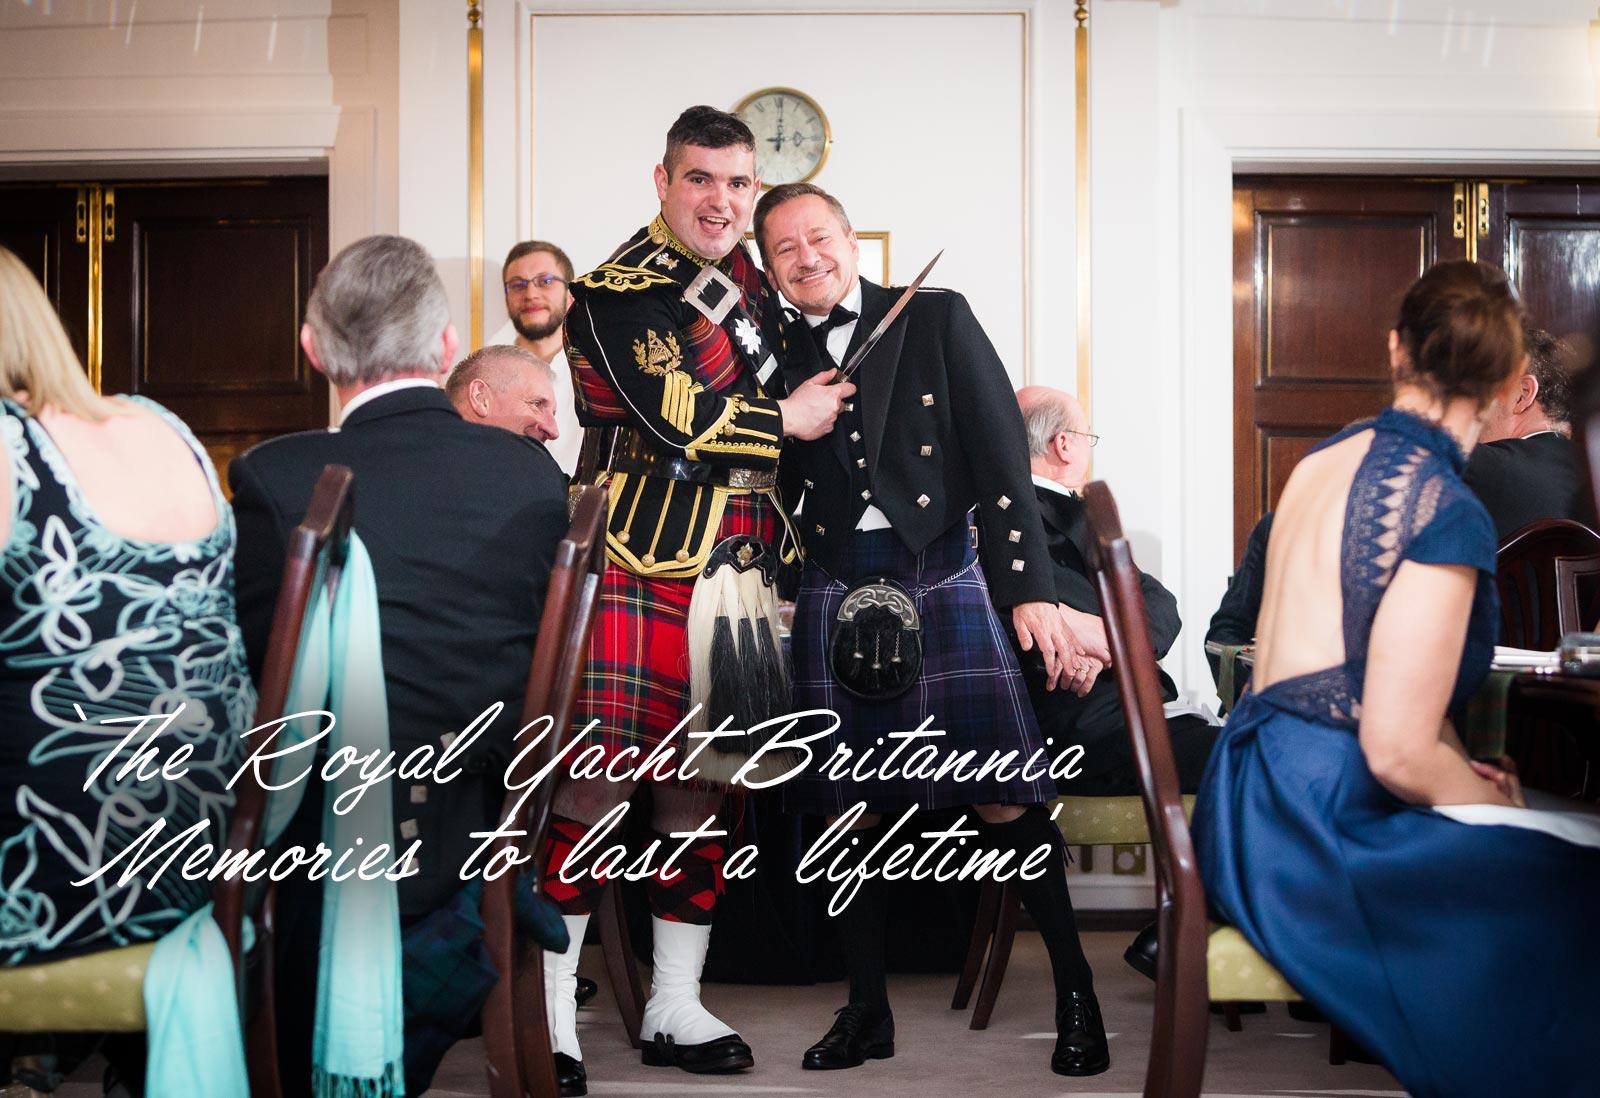 Kilts & Kisses - An Extraordinary Burns Supper on the Royal Yacht Britannia